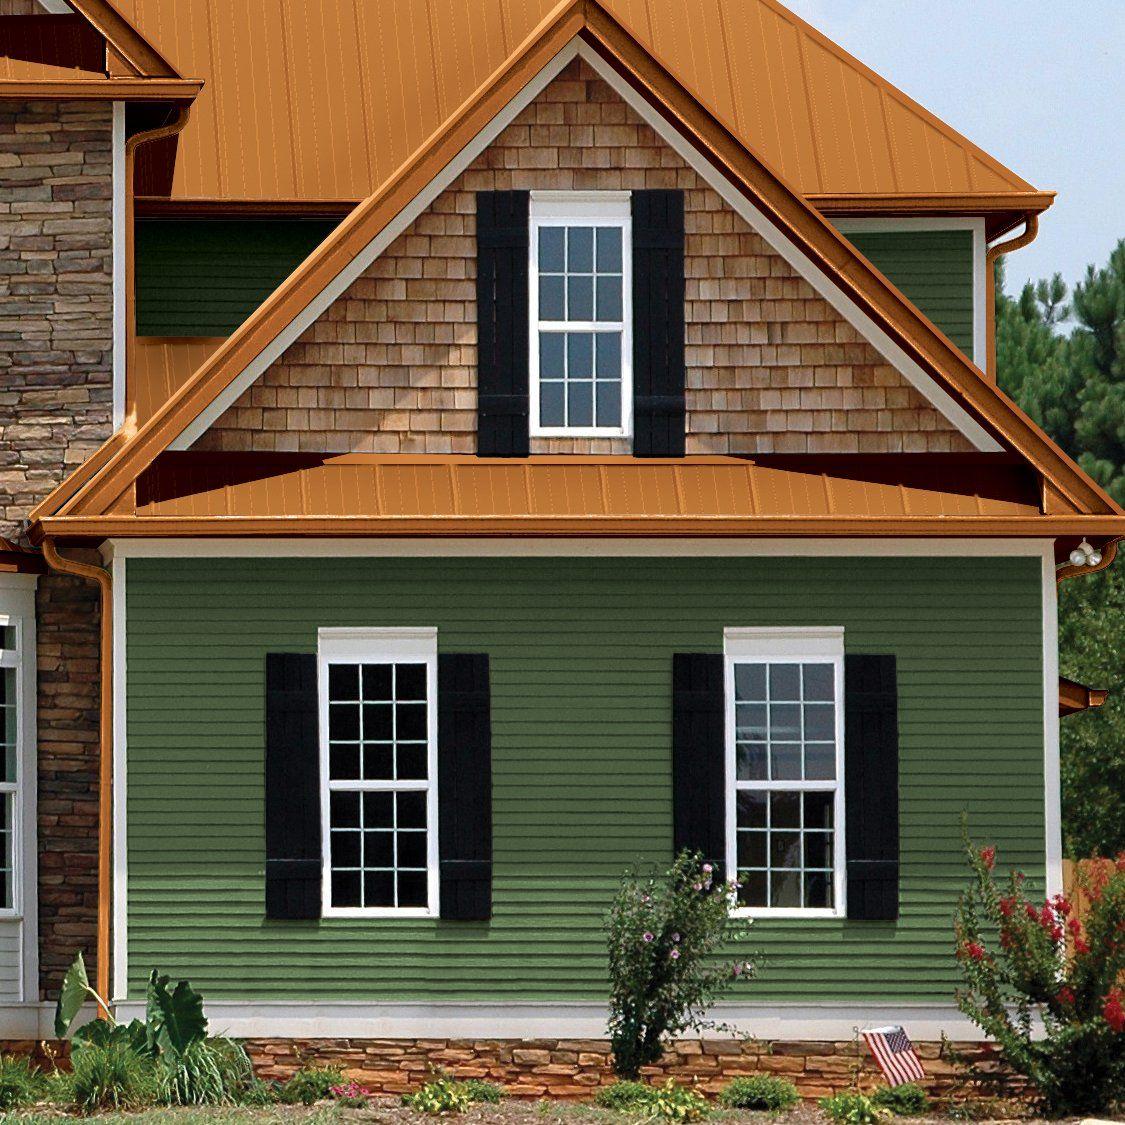 Unique Home With Amazing Lap Siding Trend Decoration Copper Roof House Vinyl Exterior Siding House Siding